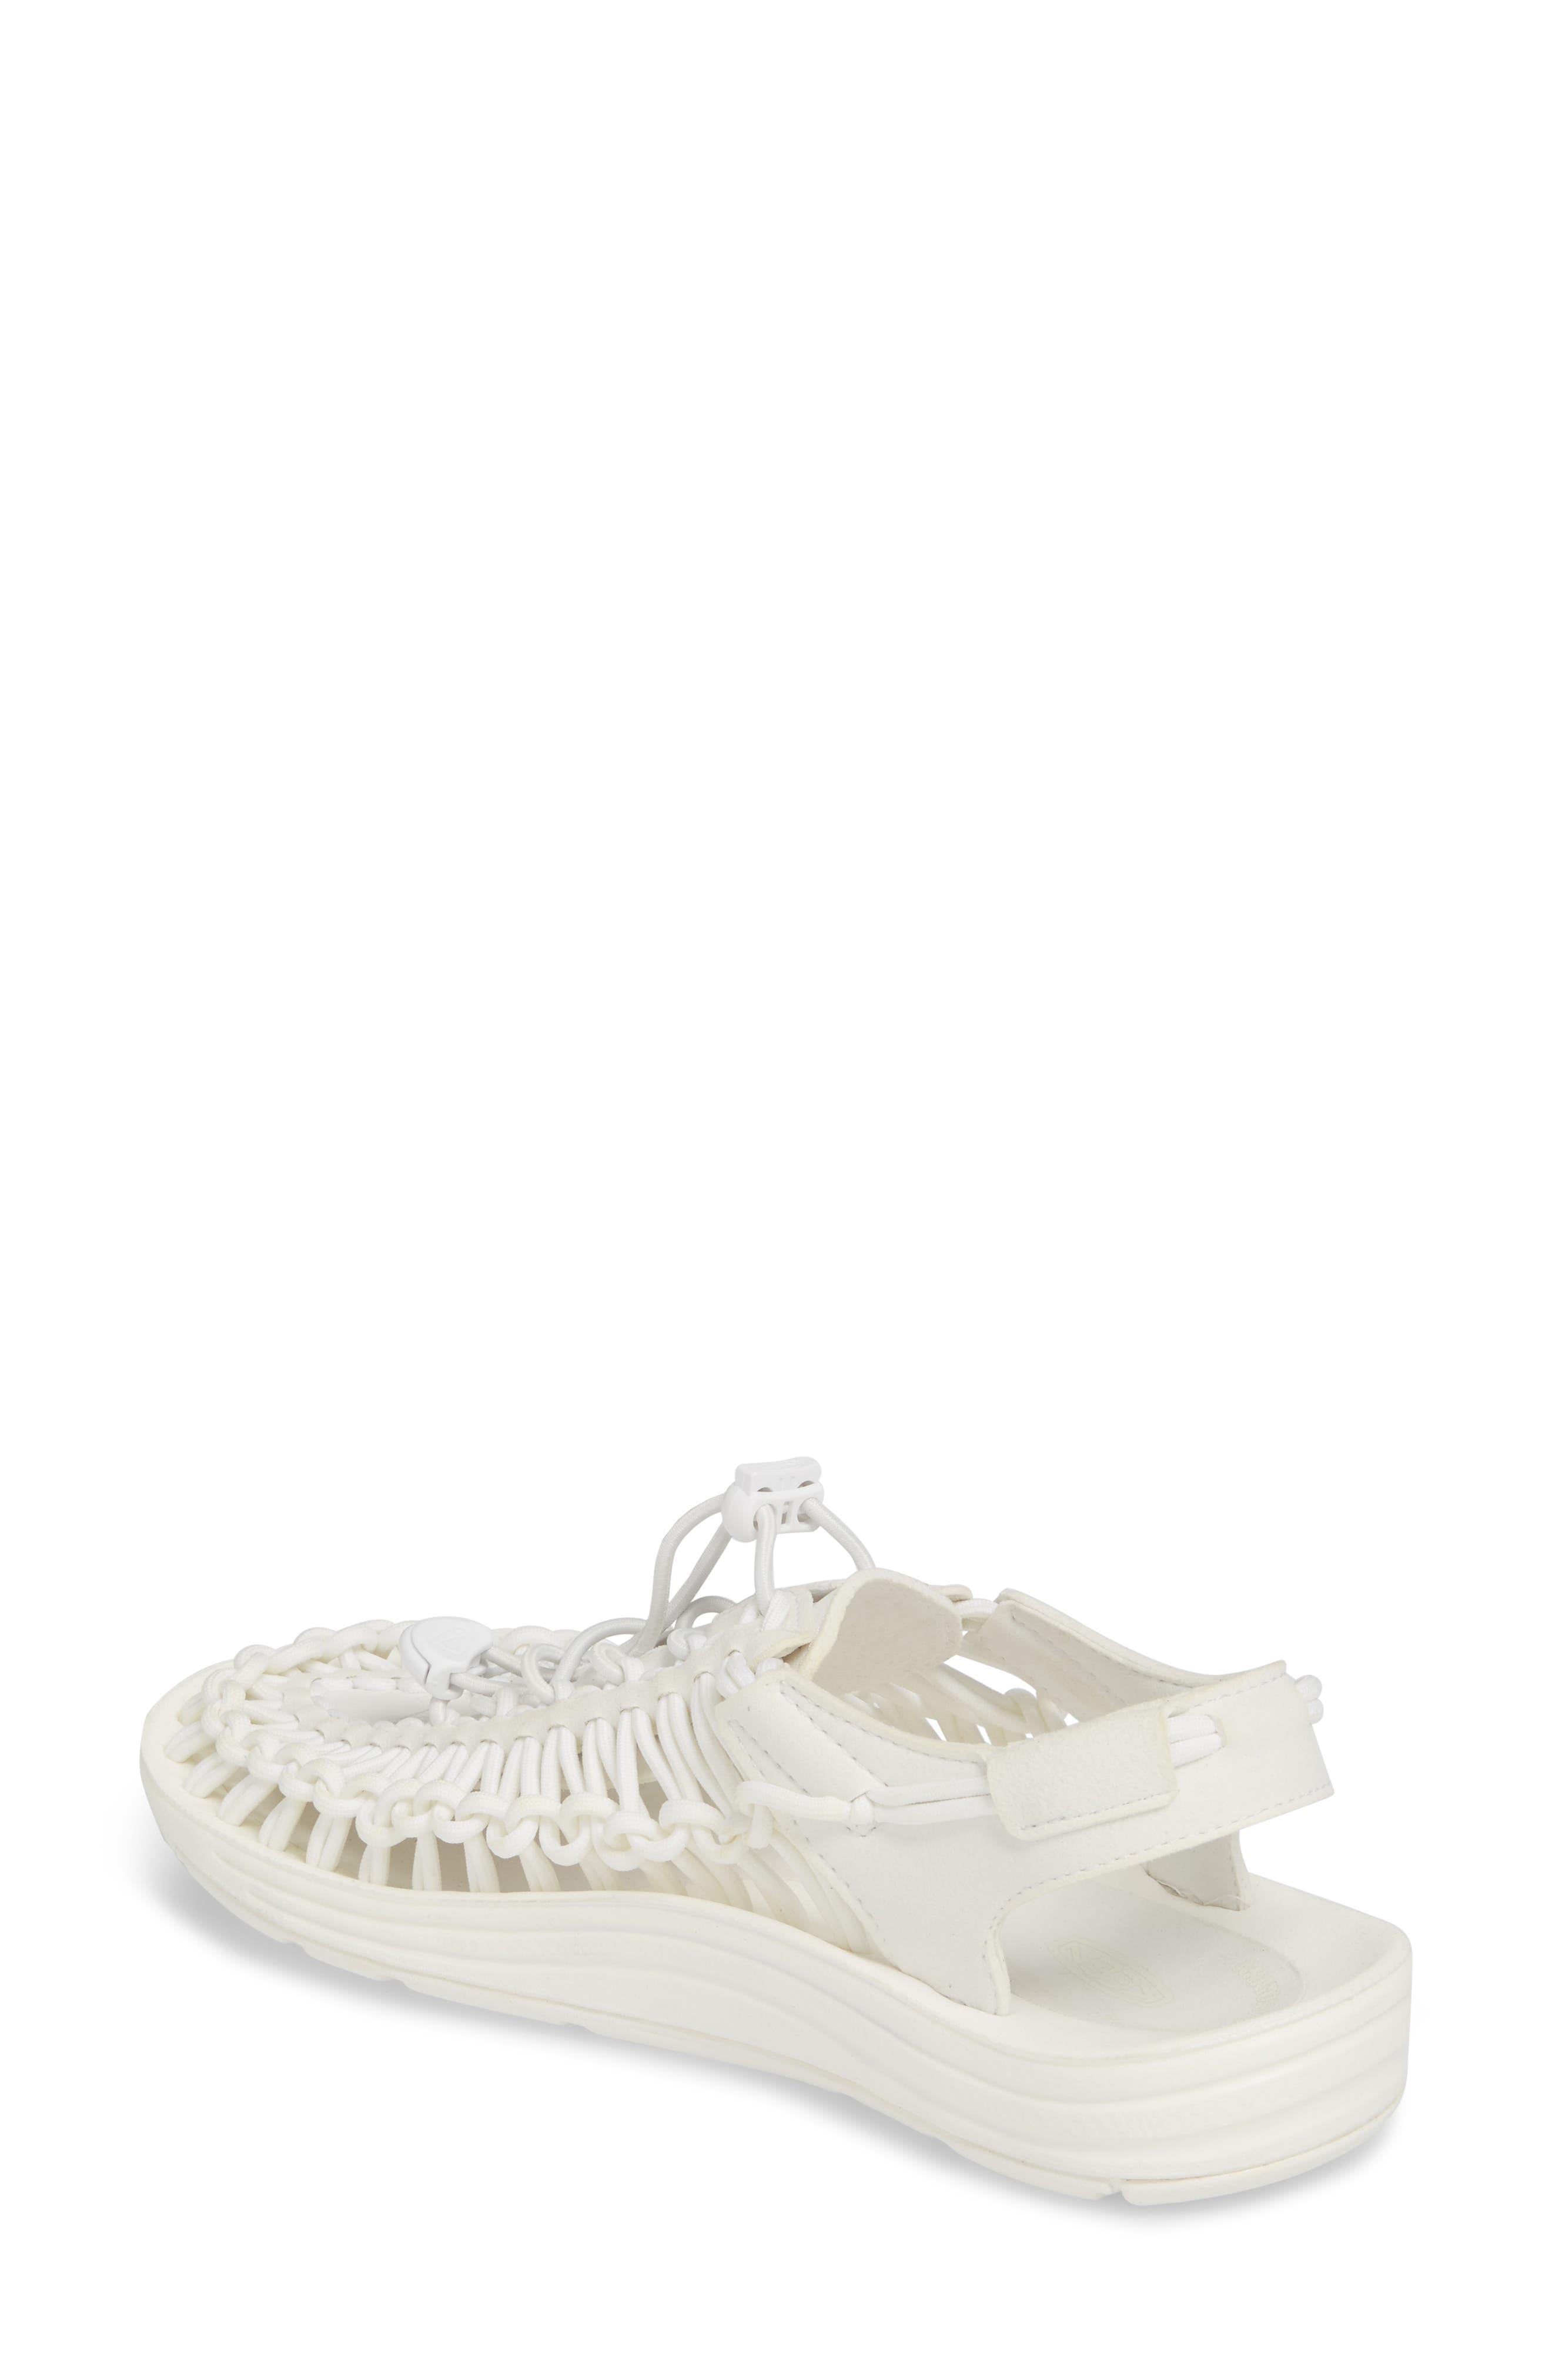 'Uneek' Water Sneaker,                             Alternate thumbnail 2, color,                             Star White